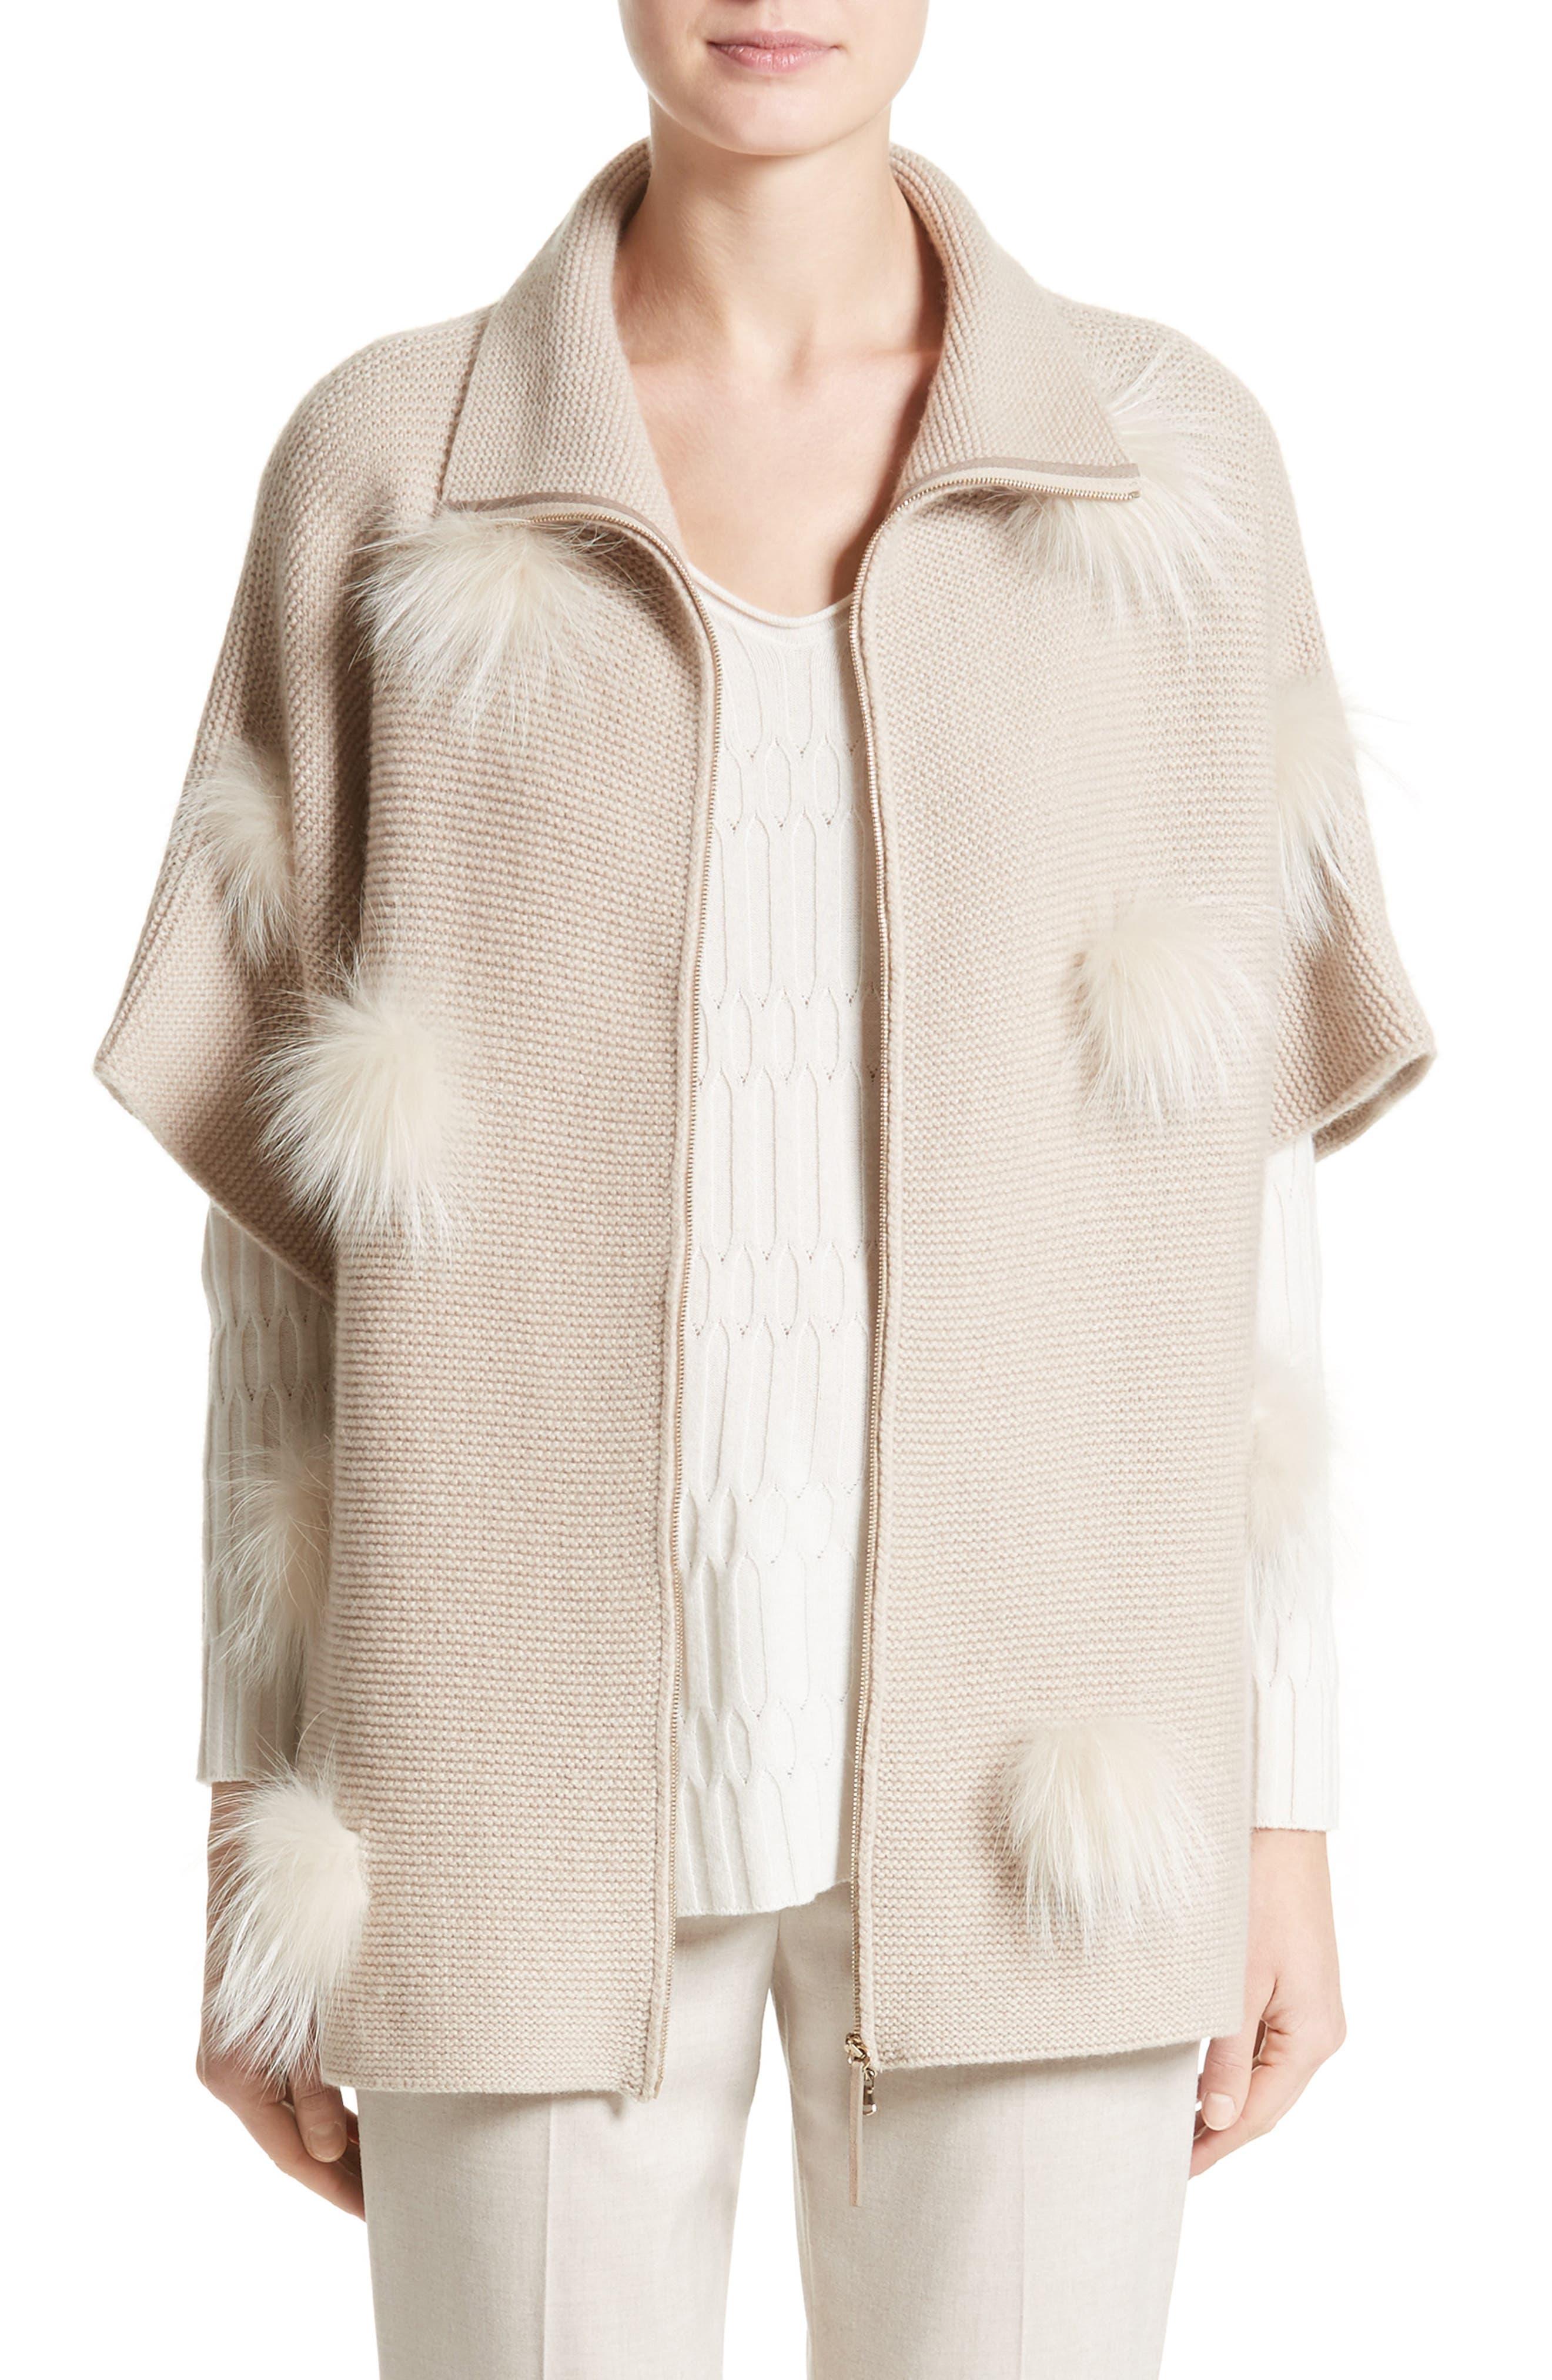 Micro Braid Cashmere Zip Cardigan with Genuine Fox Fur Trim,                             Main thumbnail 1, color,                             101